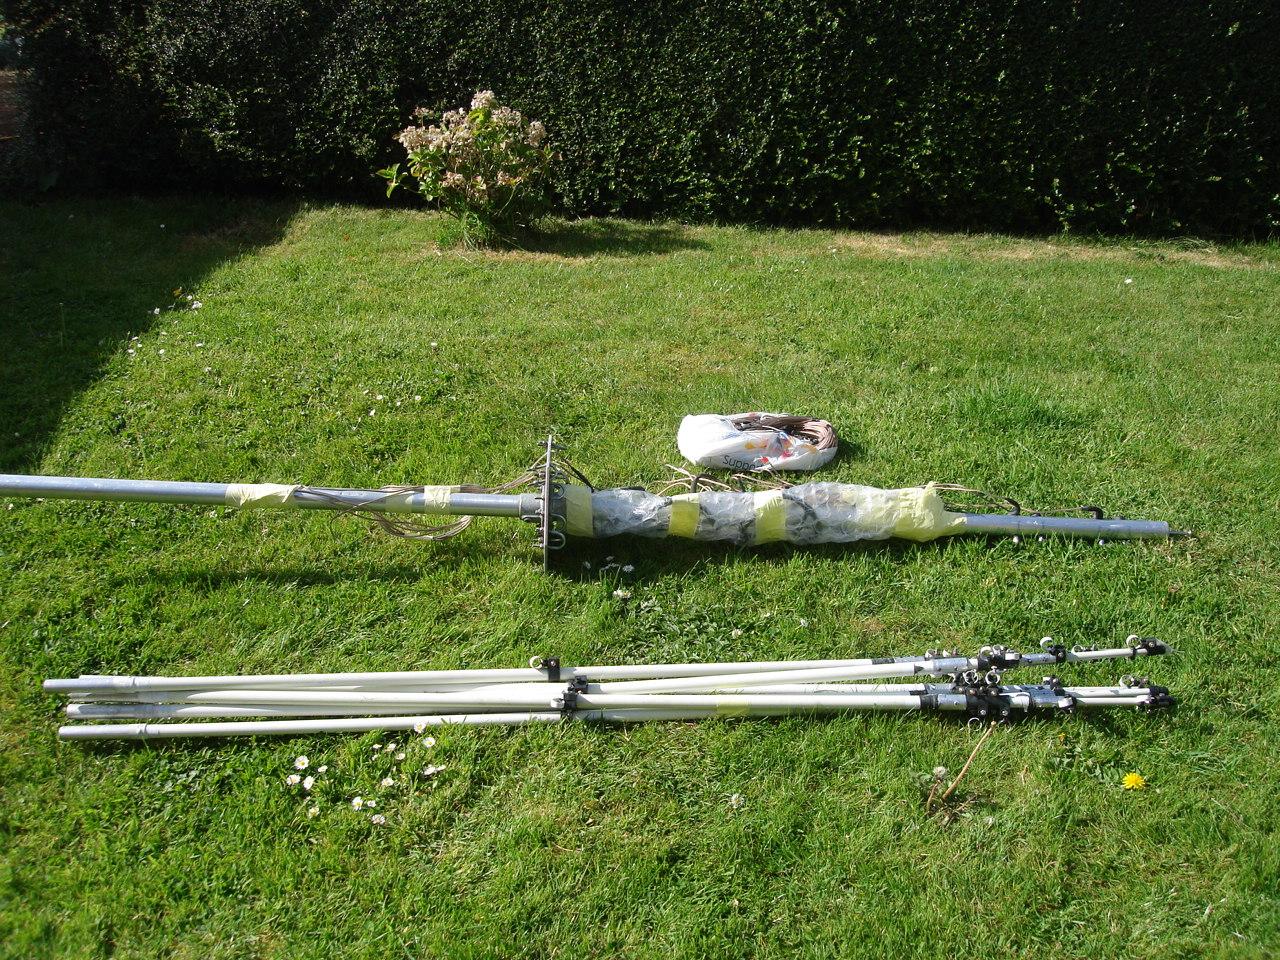 The Morse Sagas: Rebuilding the Homebrew Hexbeam Antenna